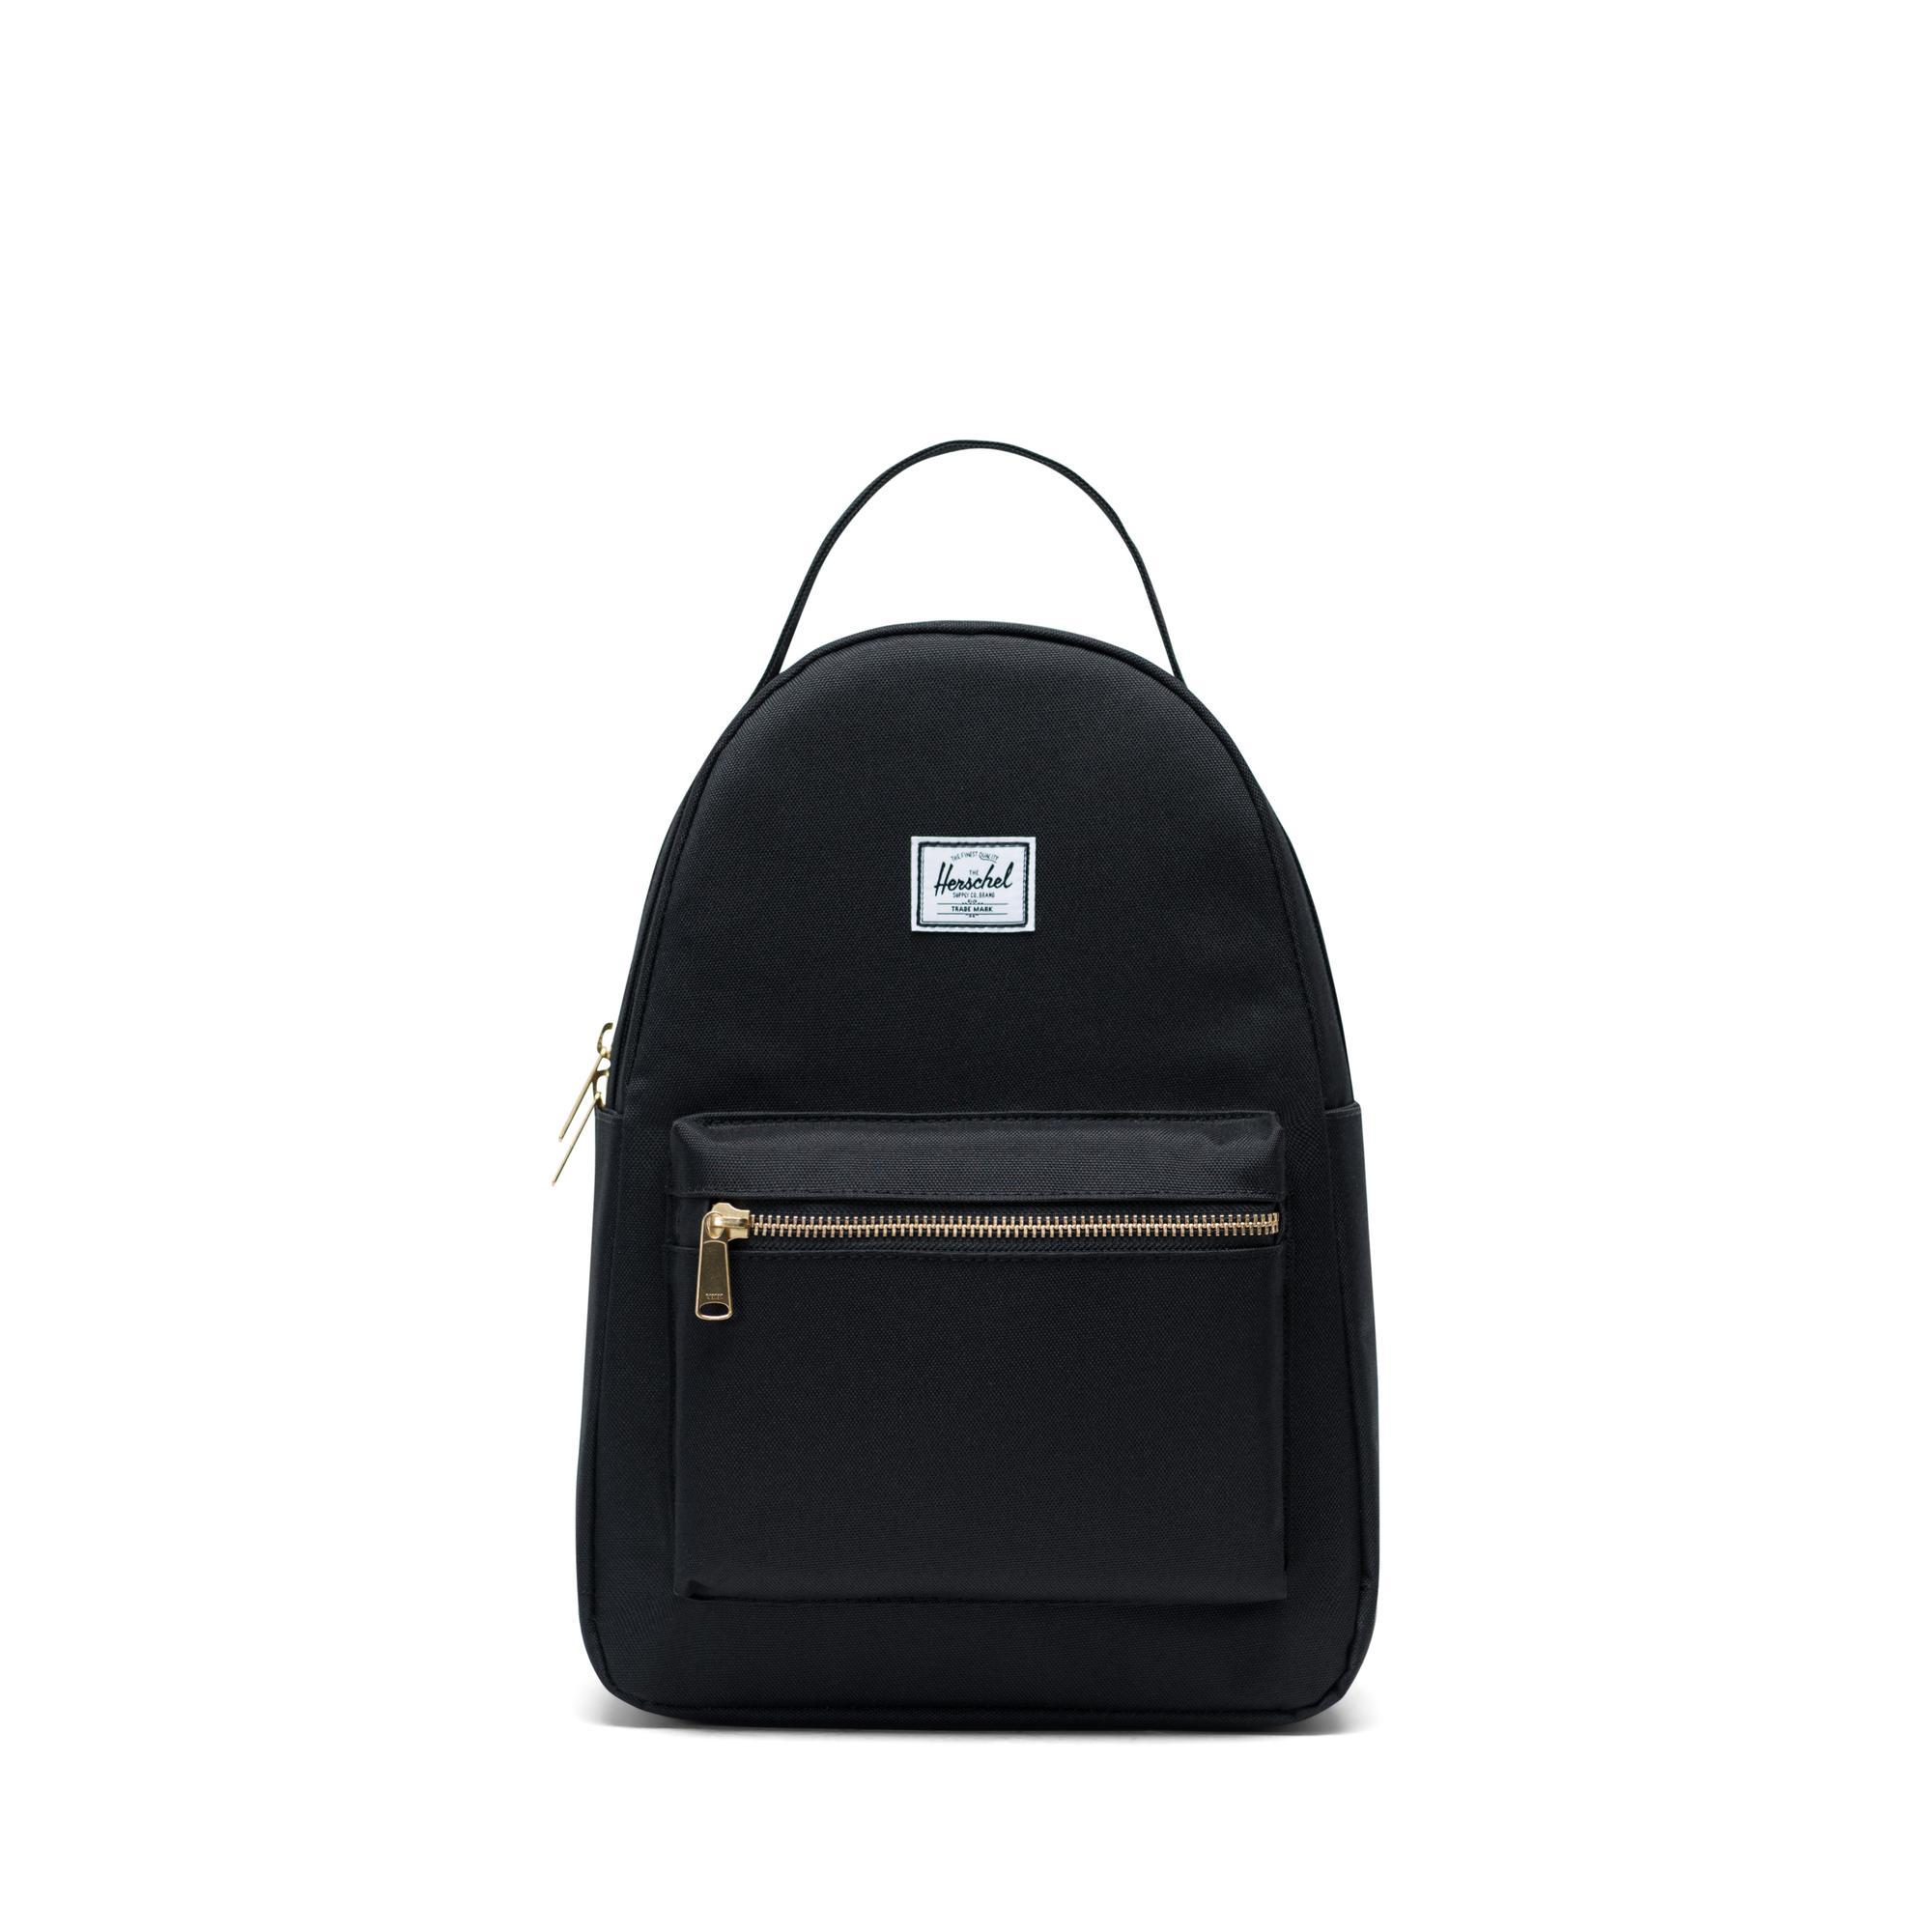 39464b4117b77 Nova Backpack XS